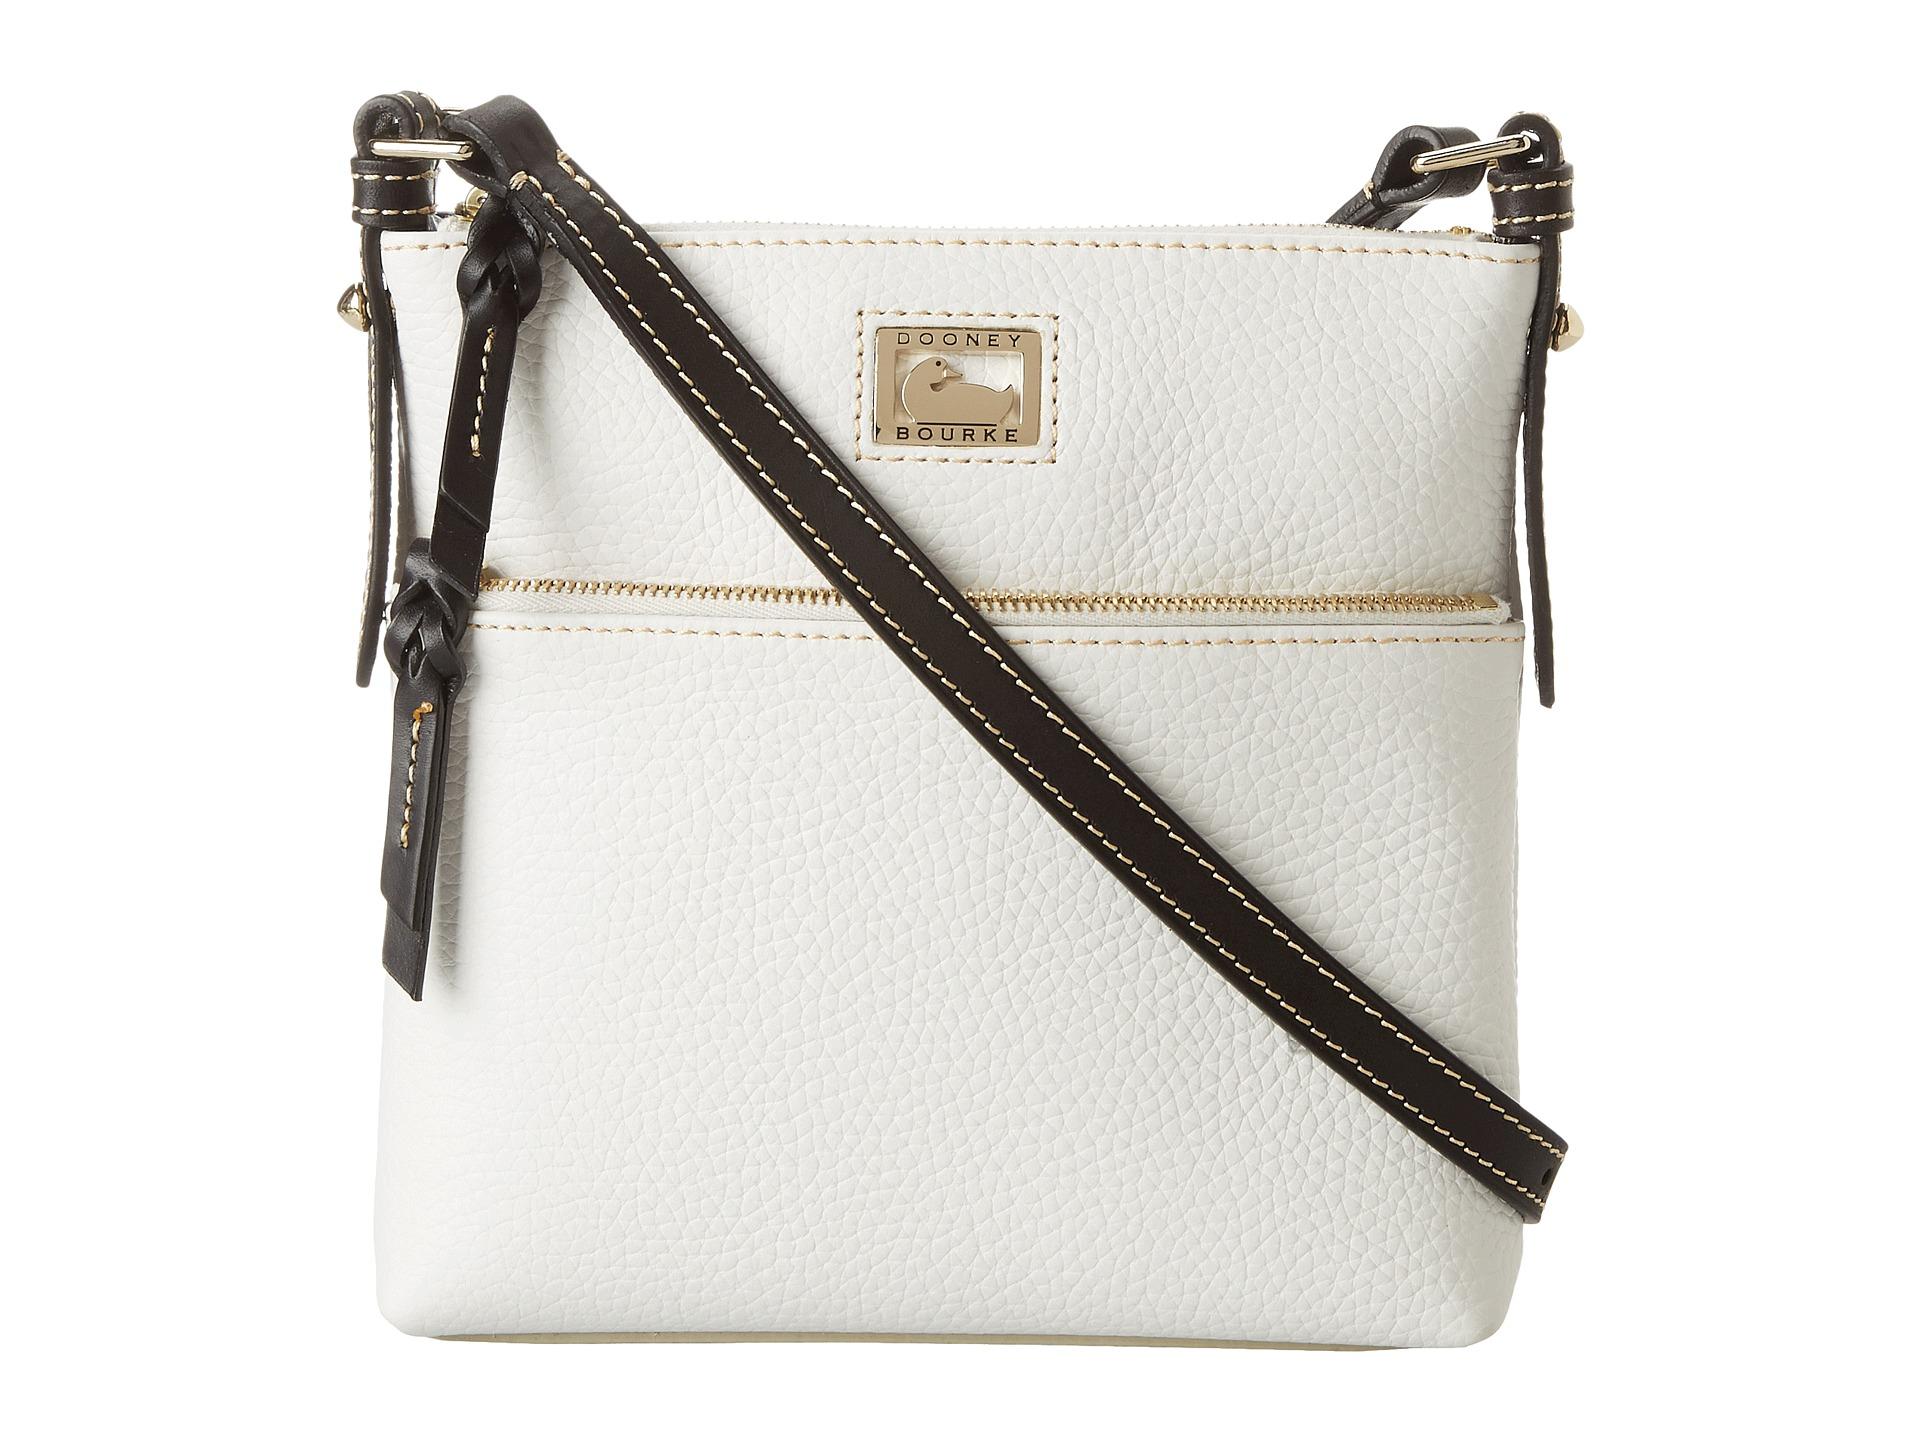 Best Shoes For Letter Carriers Dooney Bourke Dillen 2 Letter Carrier Bags Women